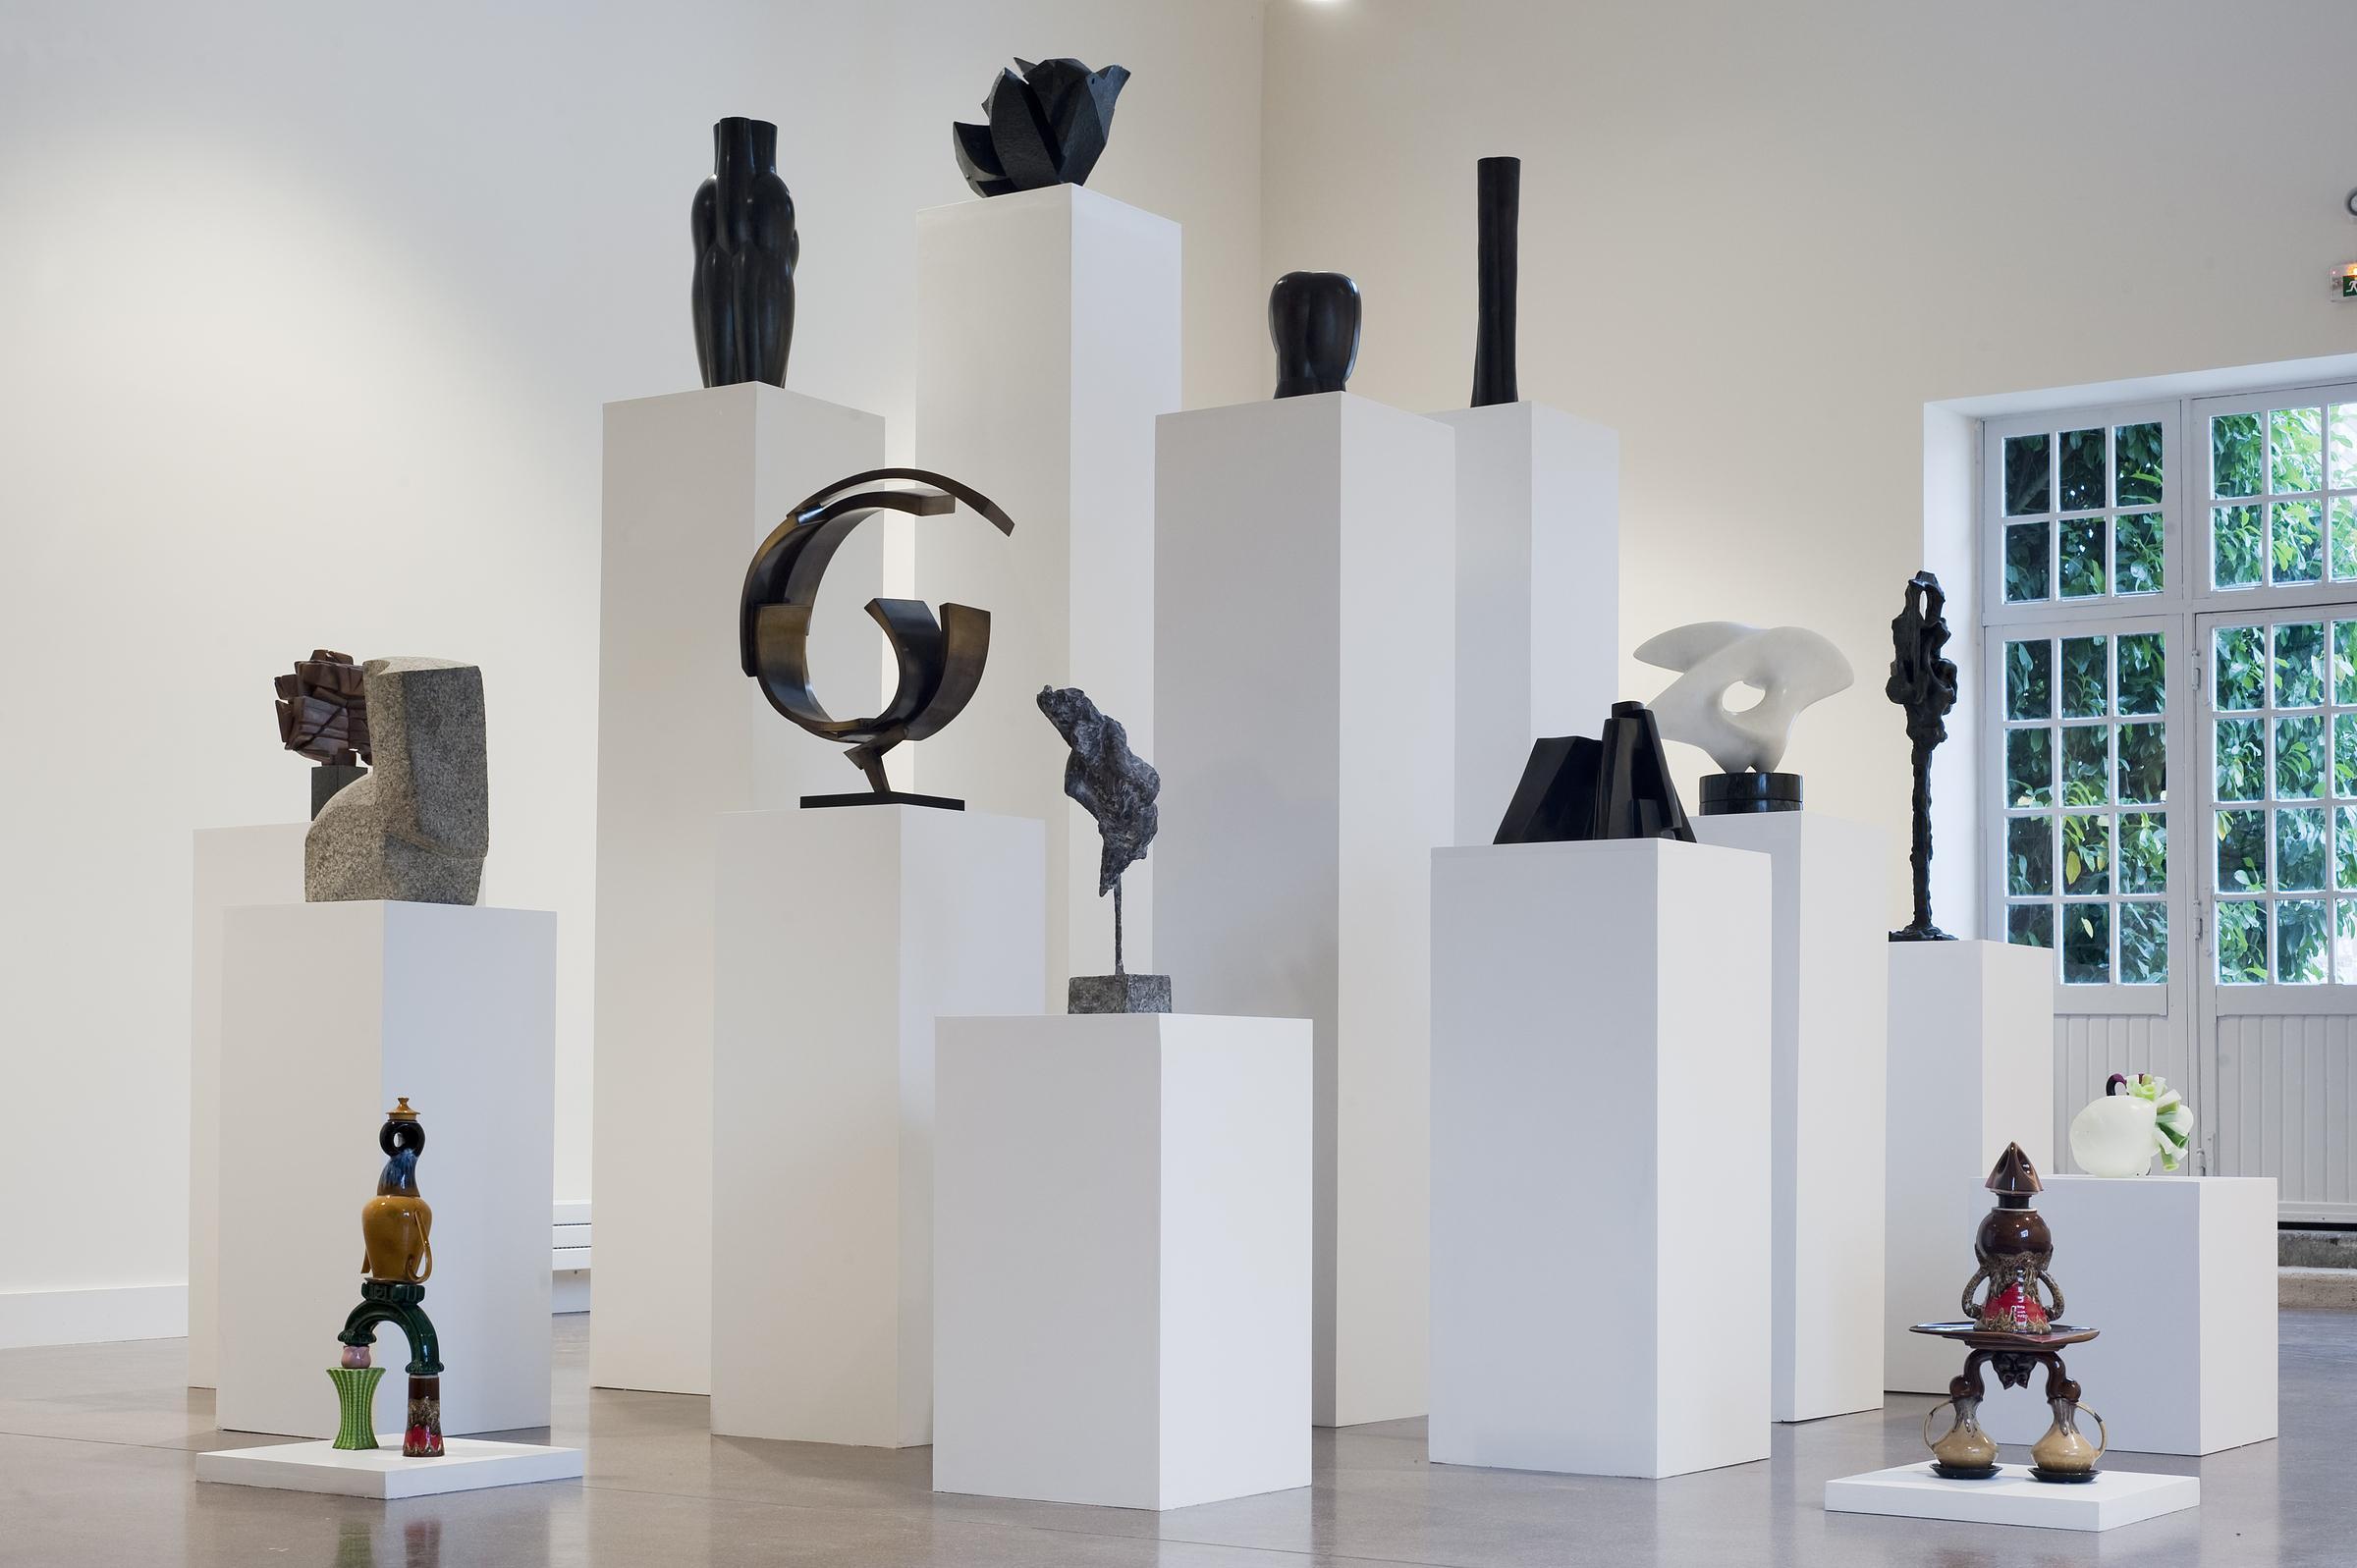 Parc culturel de Rentilly Michel Chartier - Exposi